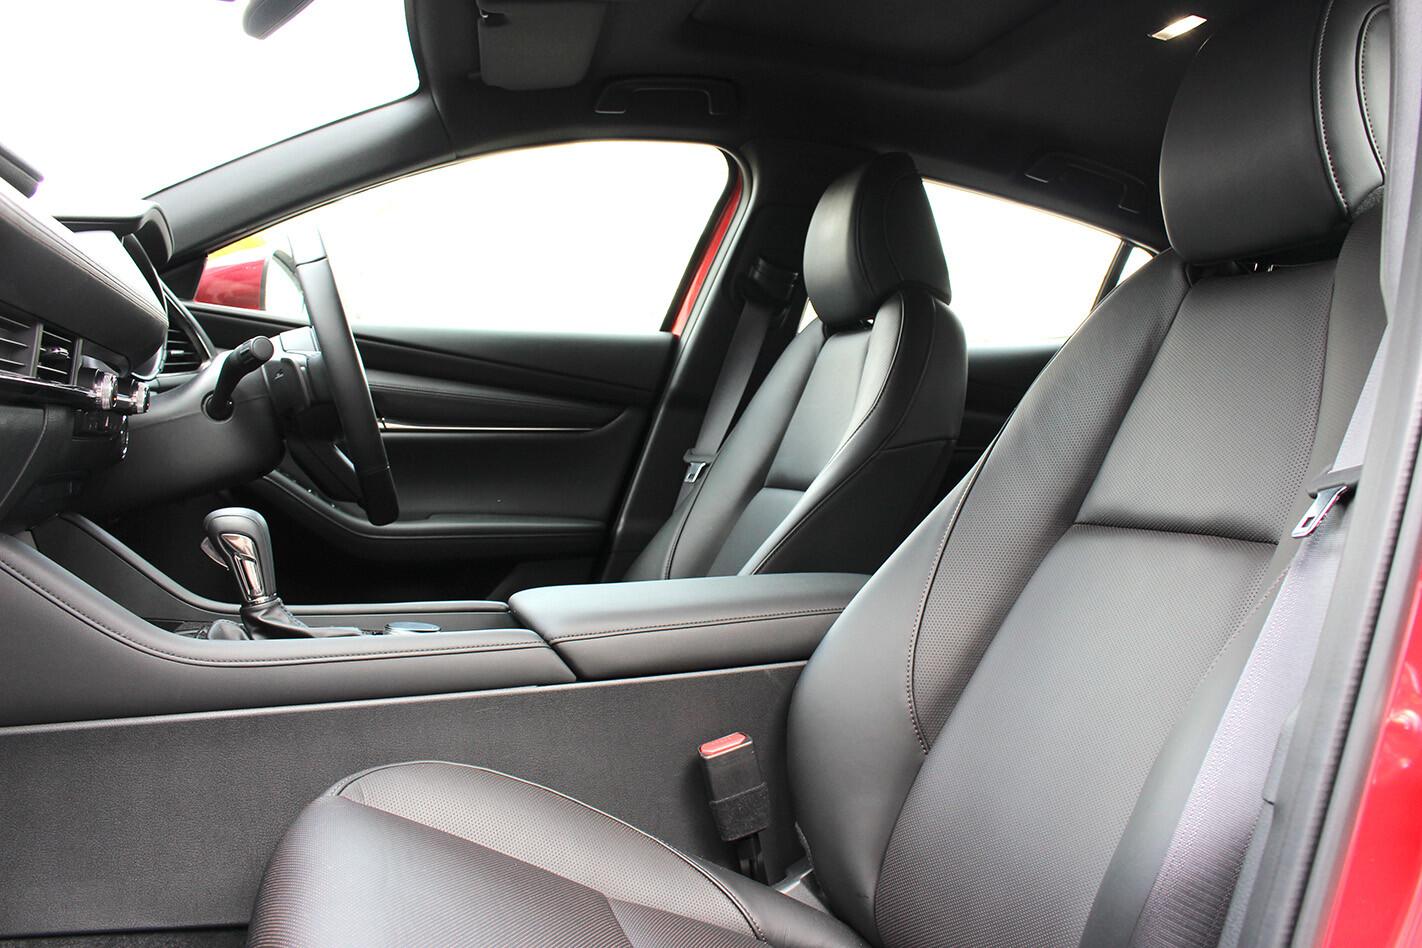 2019 Mazda 3 Astina Interior Frontseats Jpg